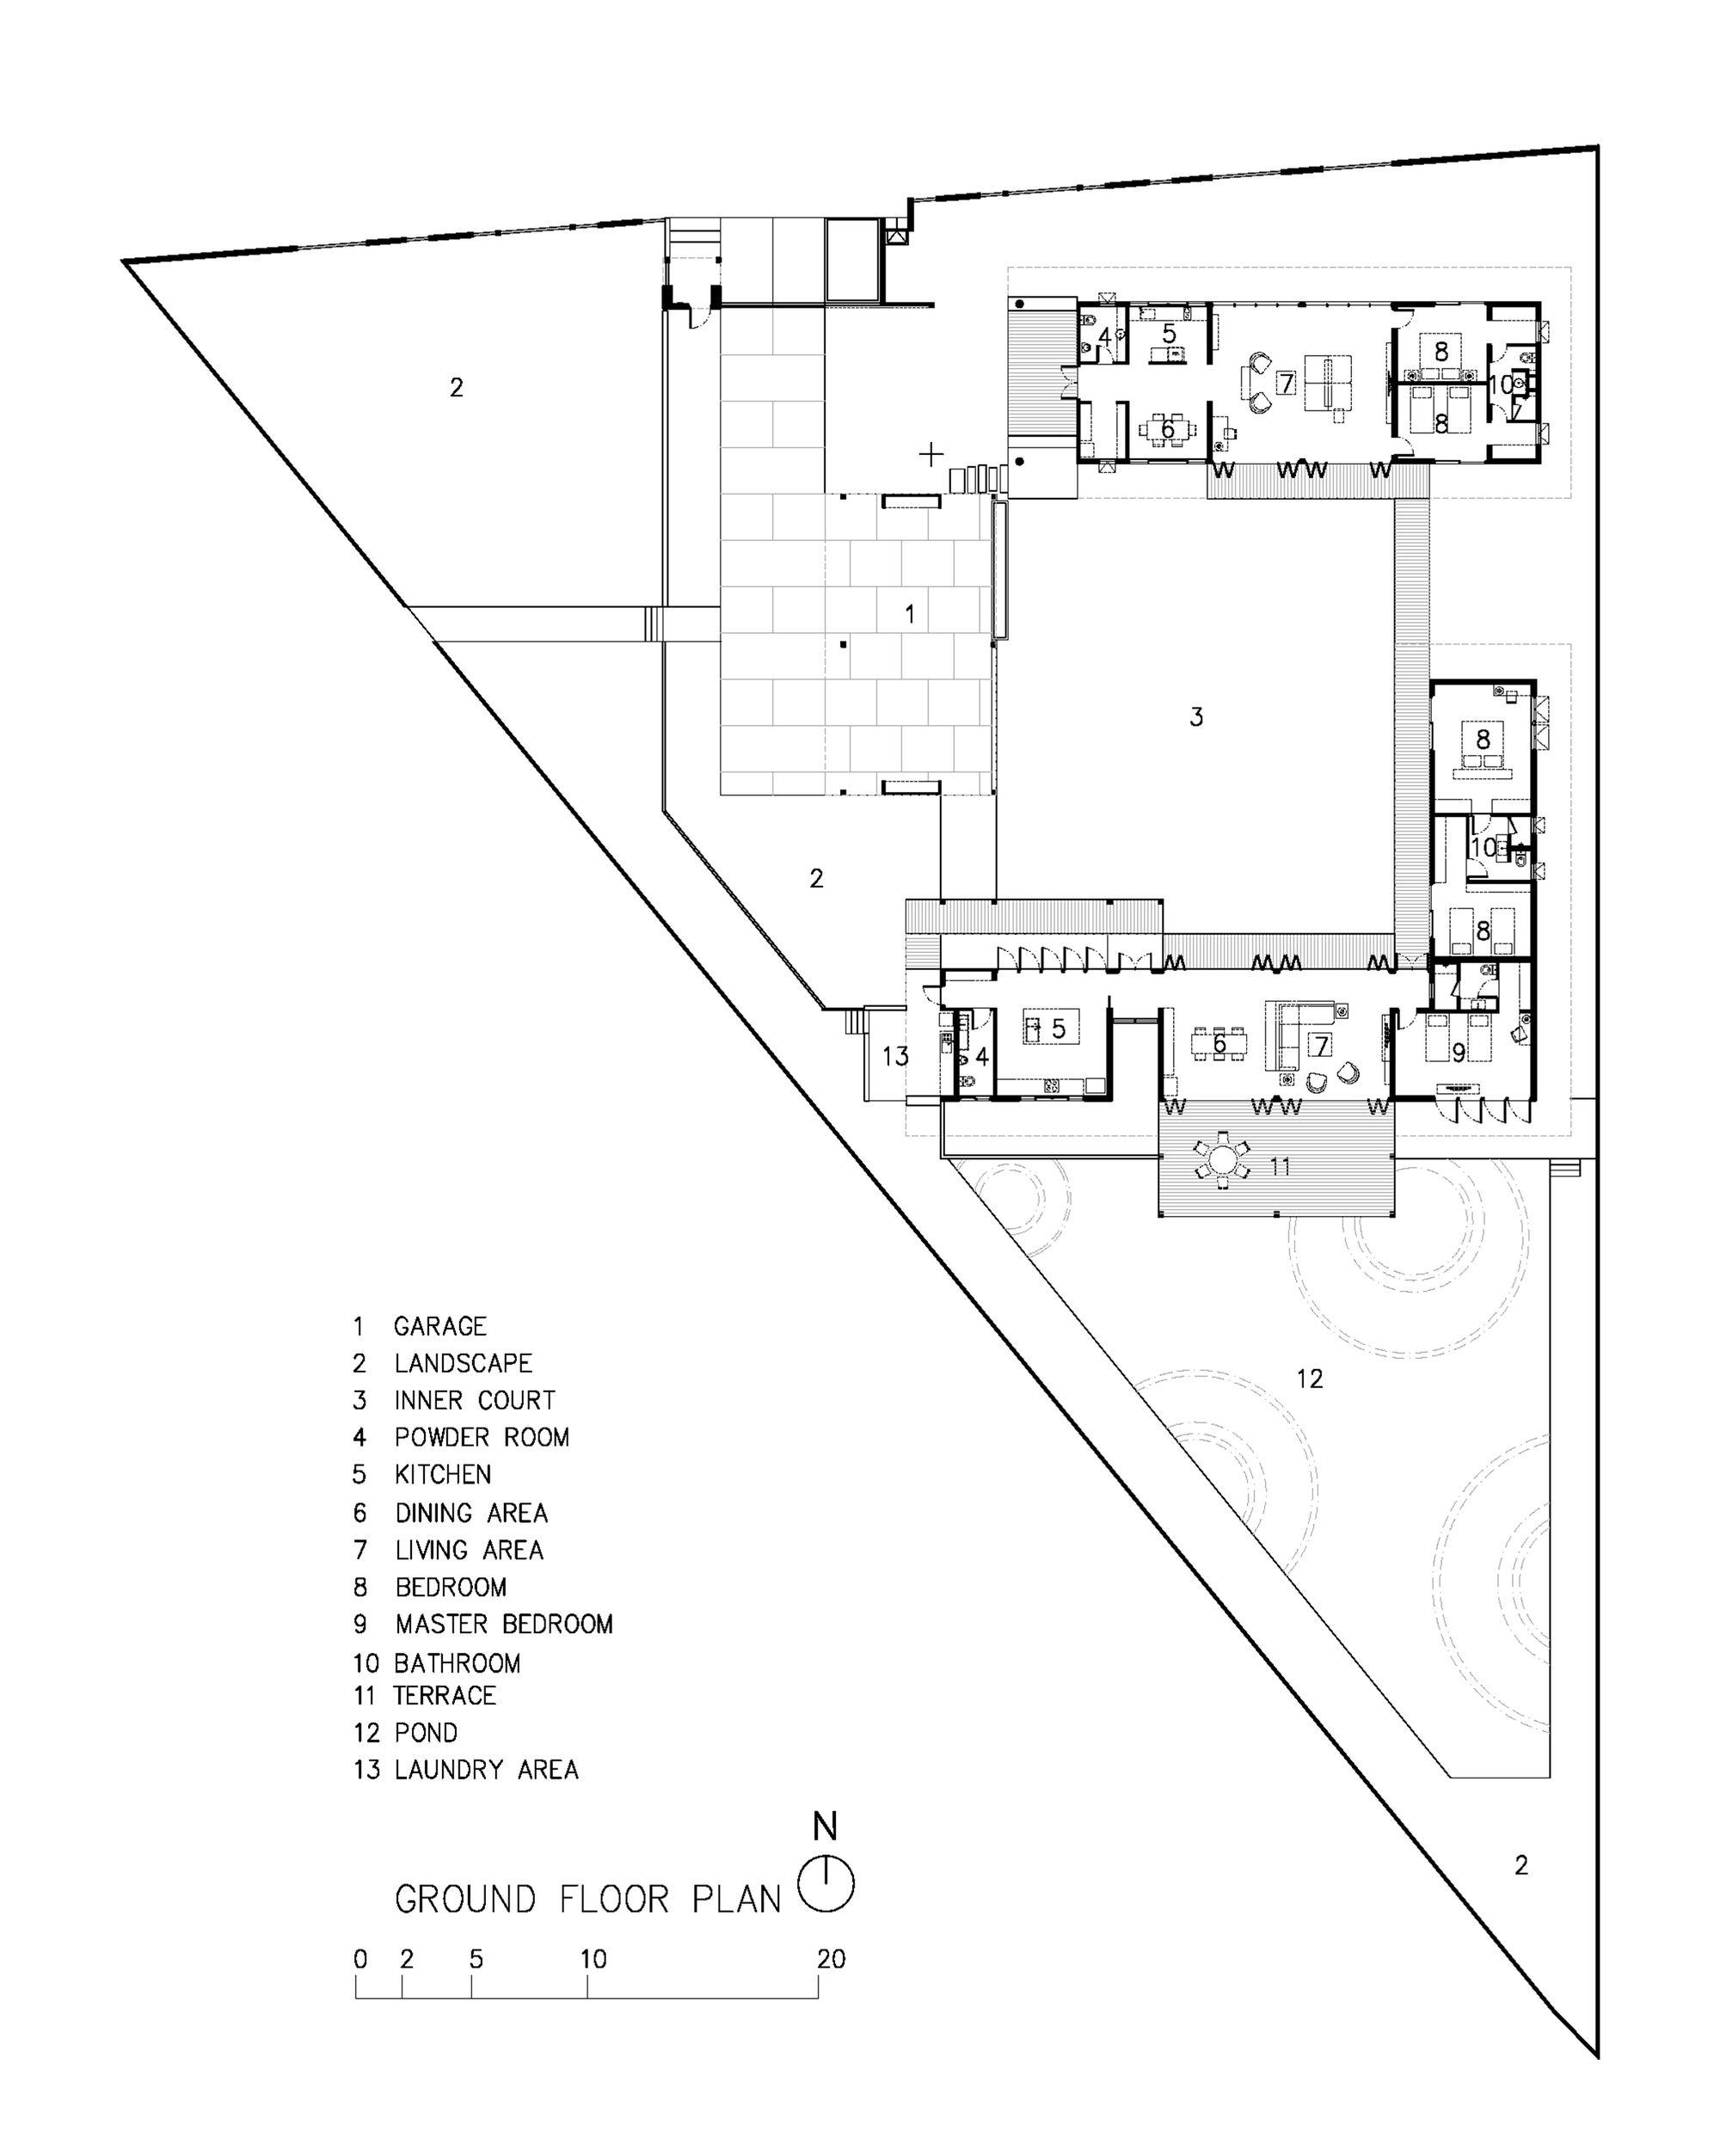 0c1c0de6ecb4460f4069844447bd5a09 Top Result 50 New 7 Bedroom House Plans Gallery 2017 Hgd6